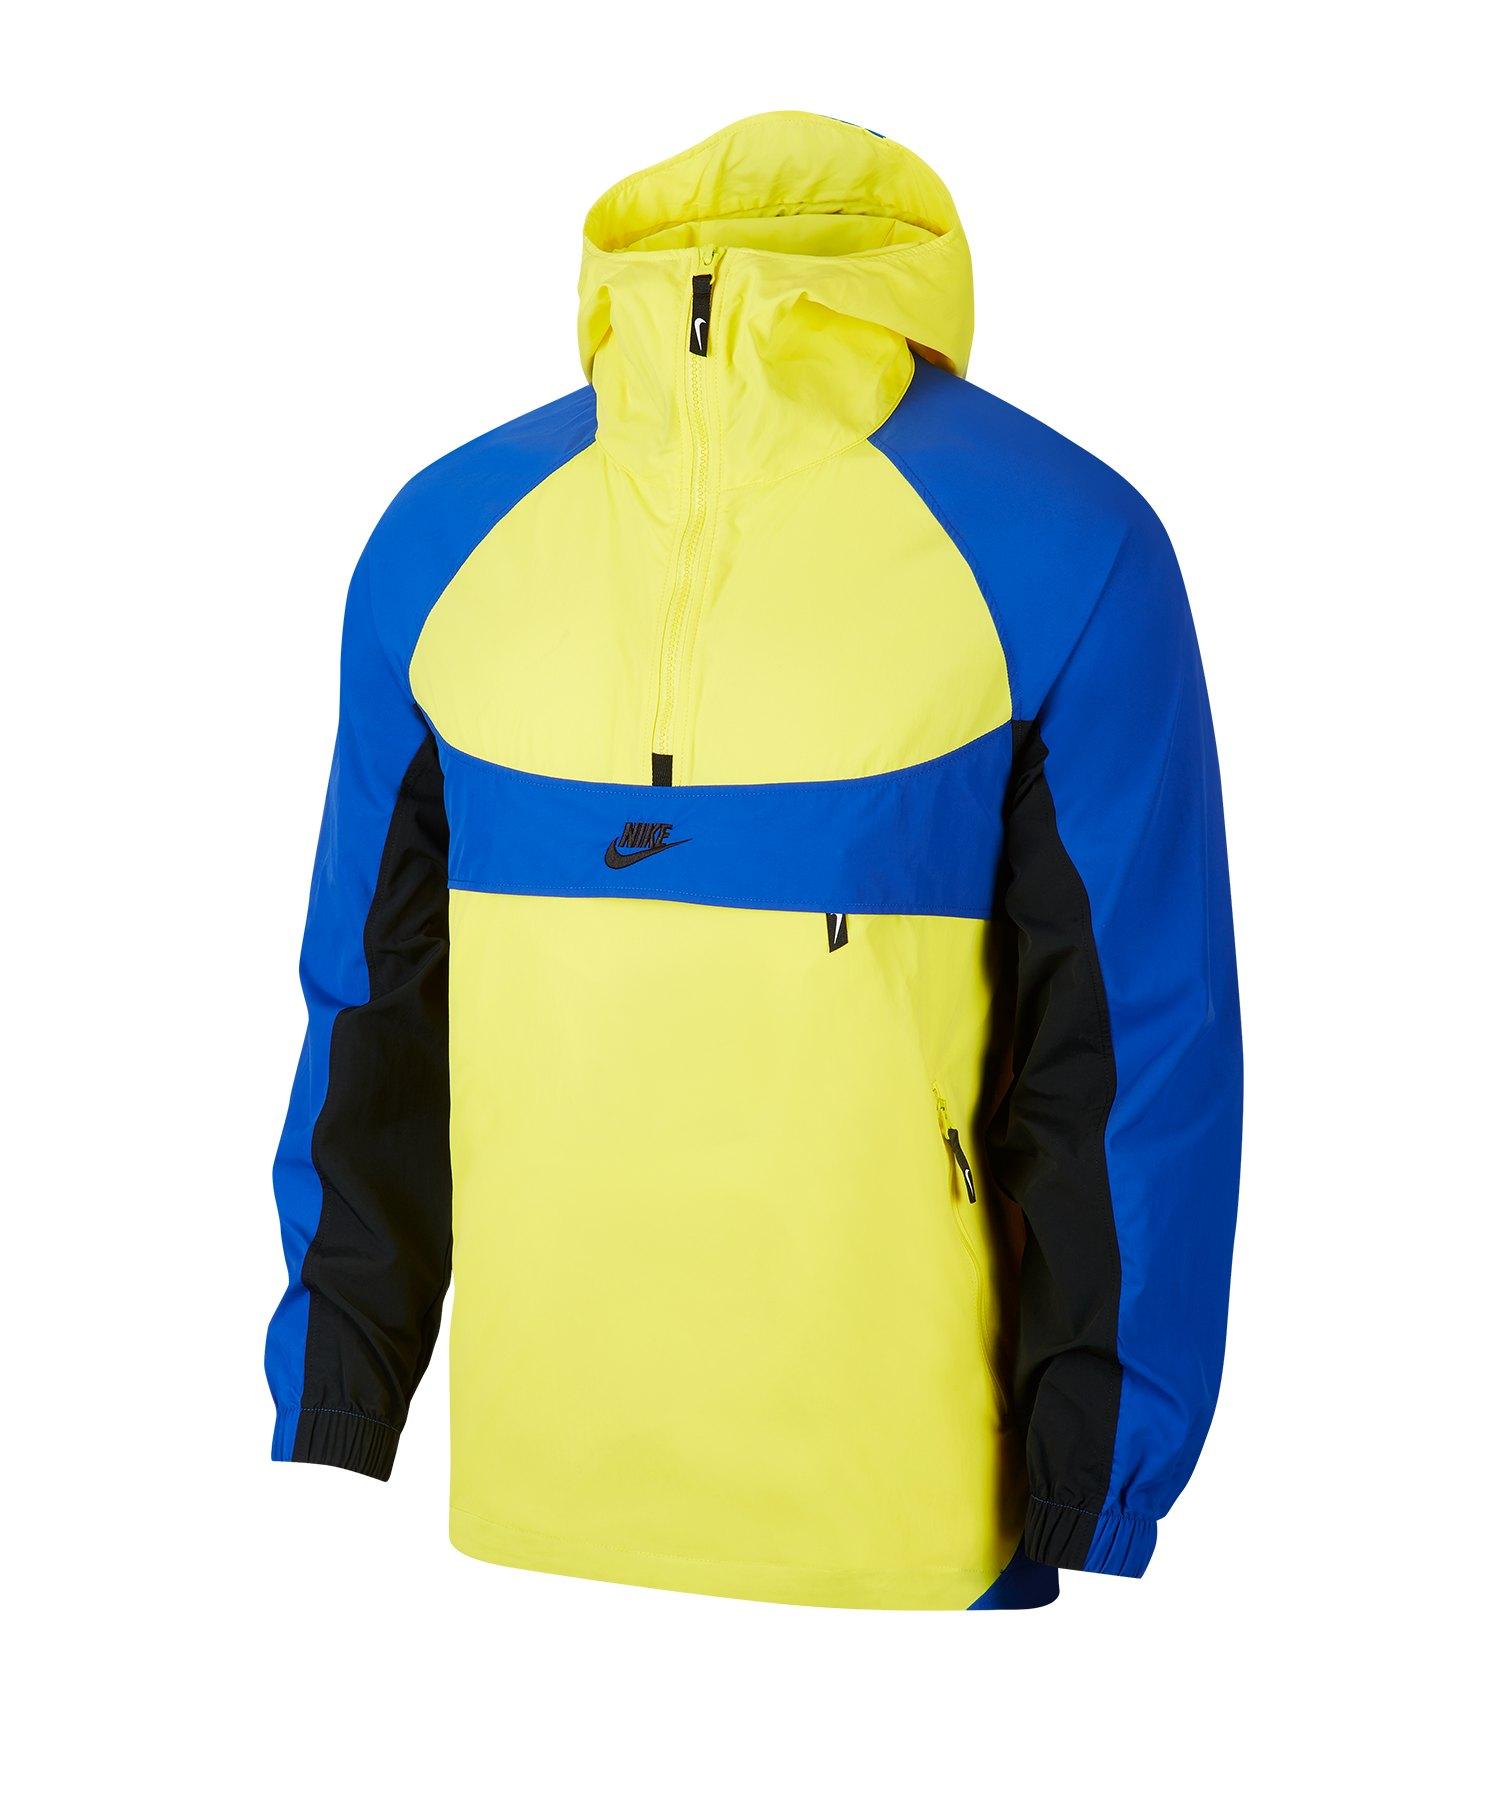 Nike Woven Re-Issue Trainingsjacke Gelb F740 - gelb